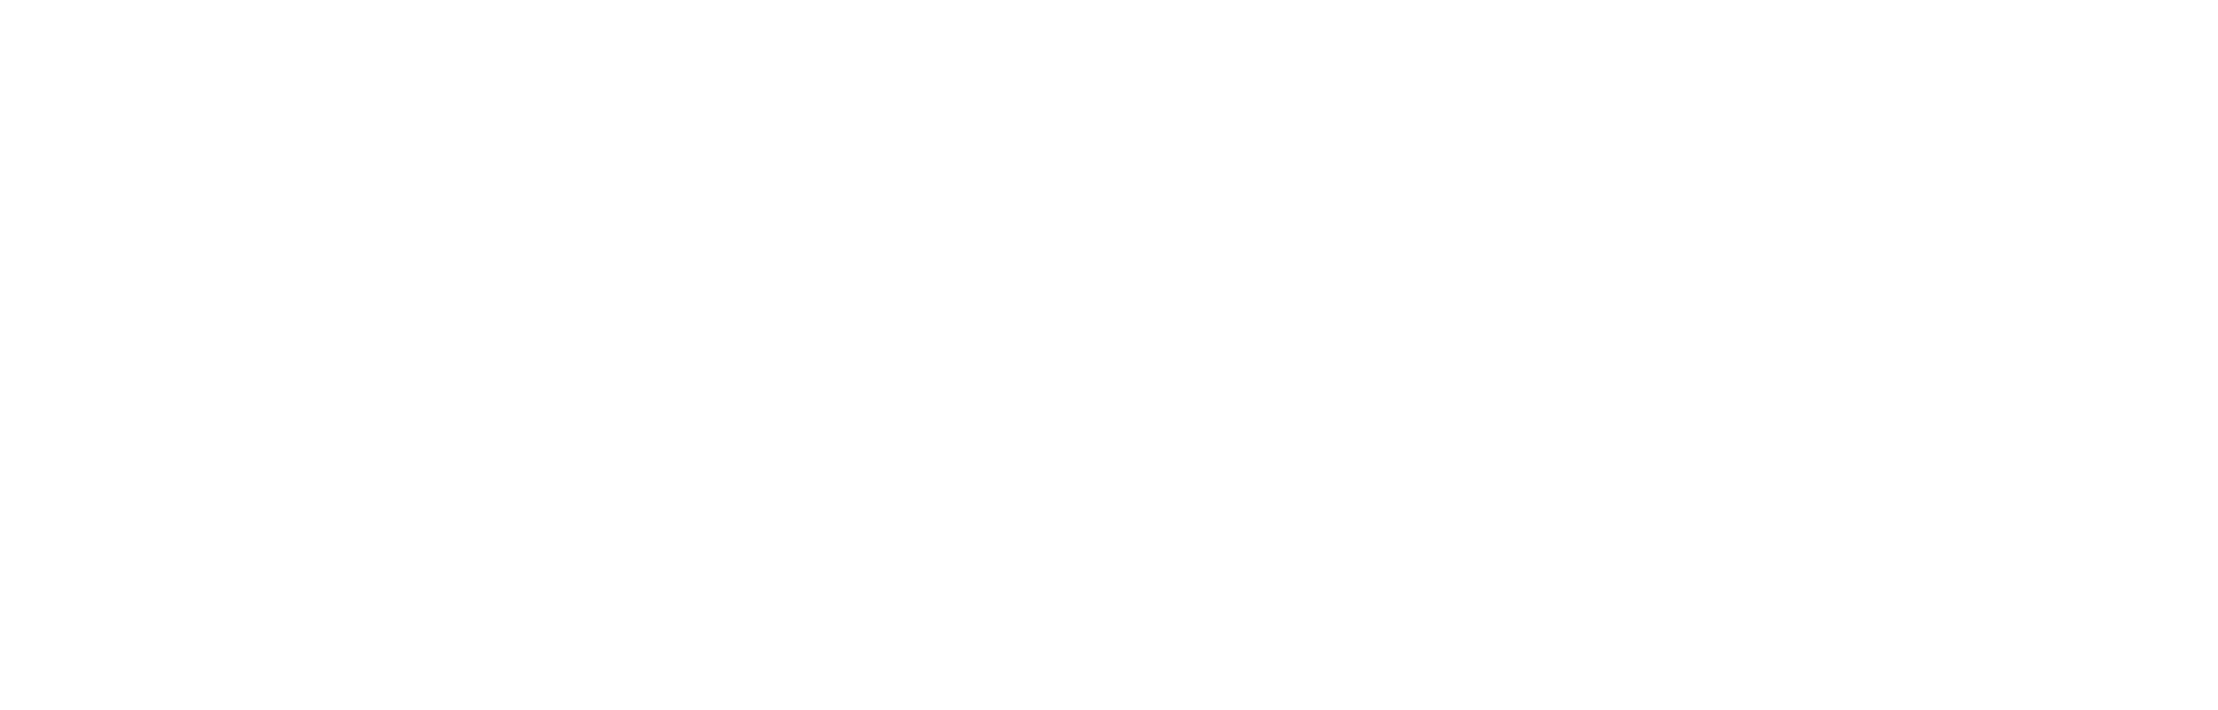 Pillift - windy, montaż i serwis